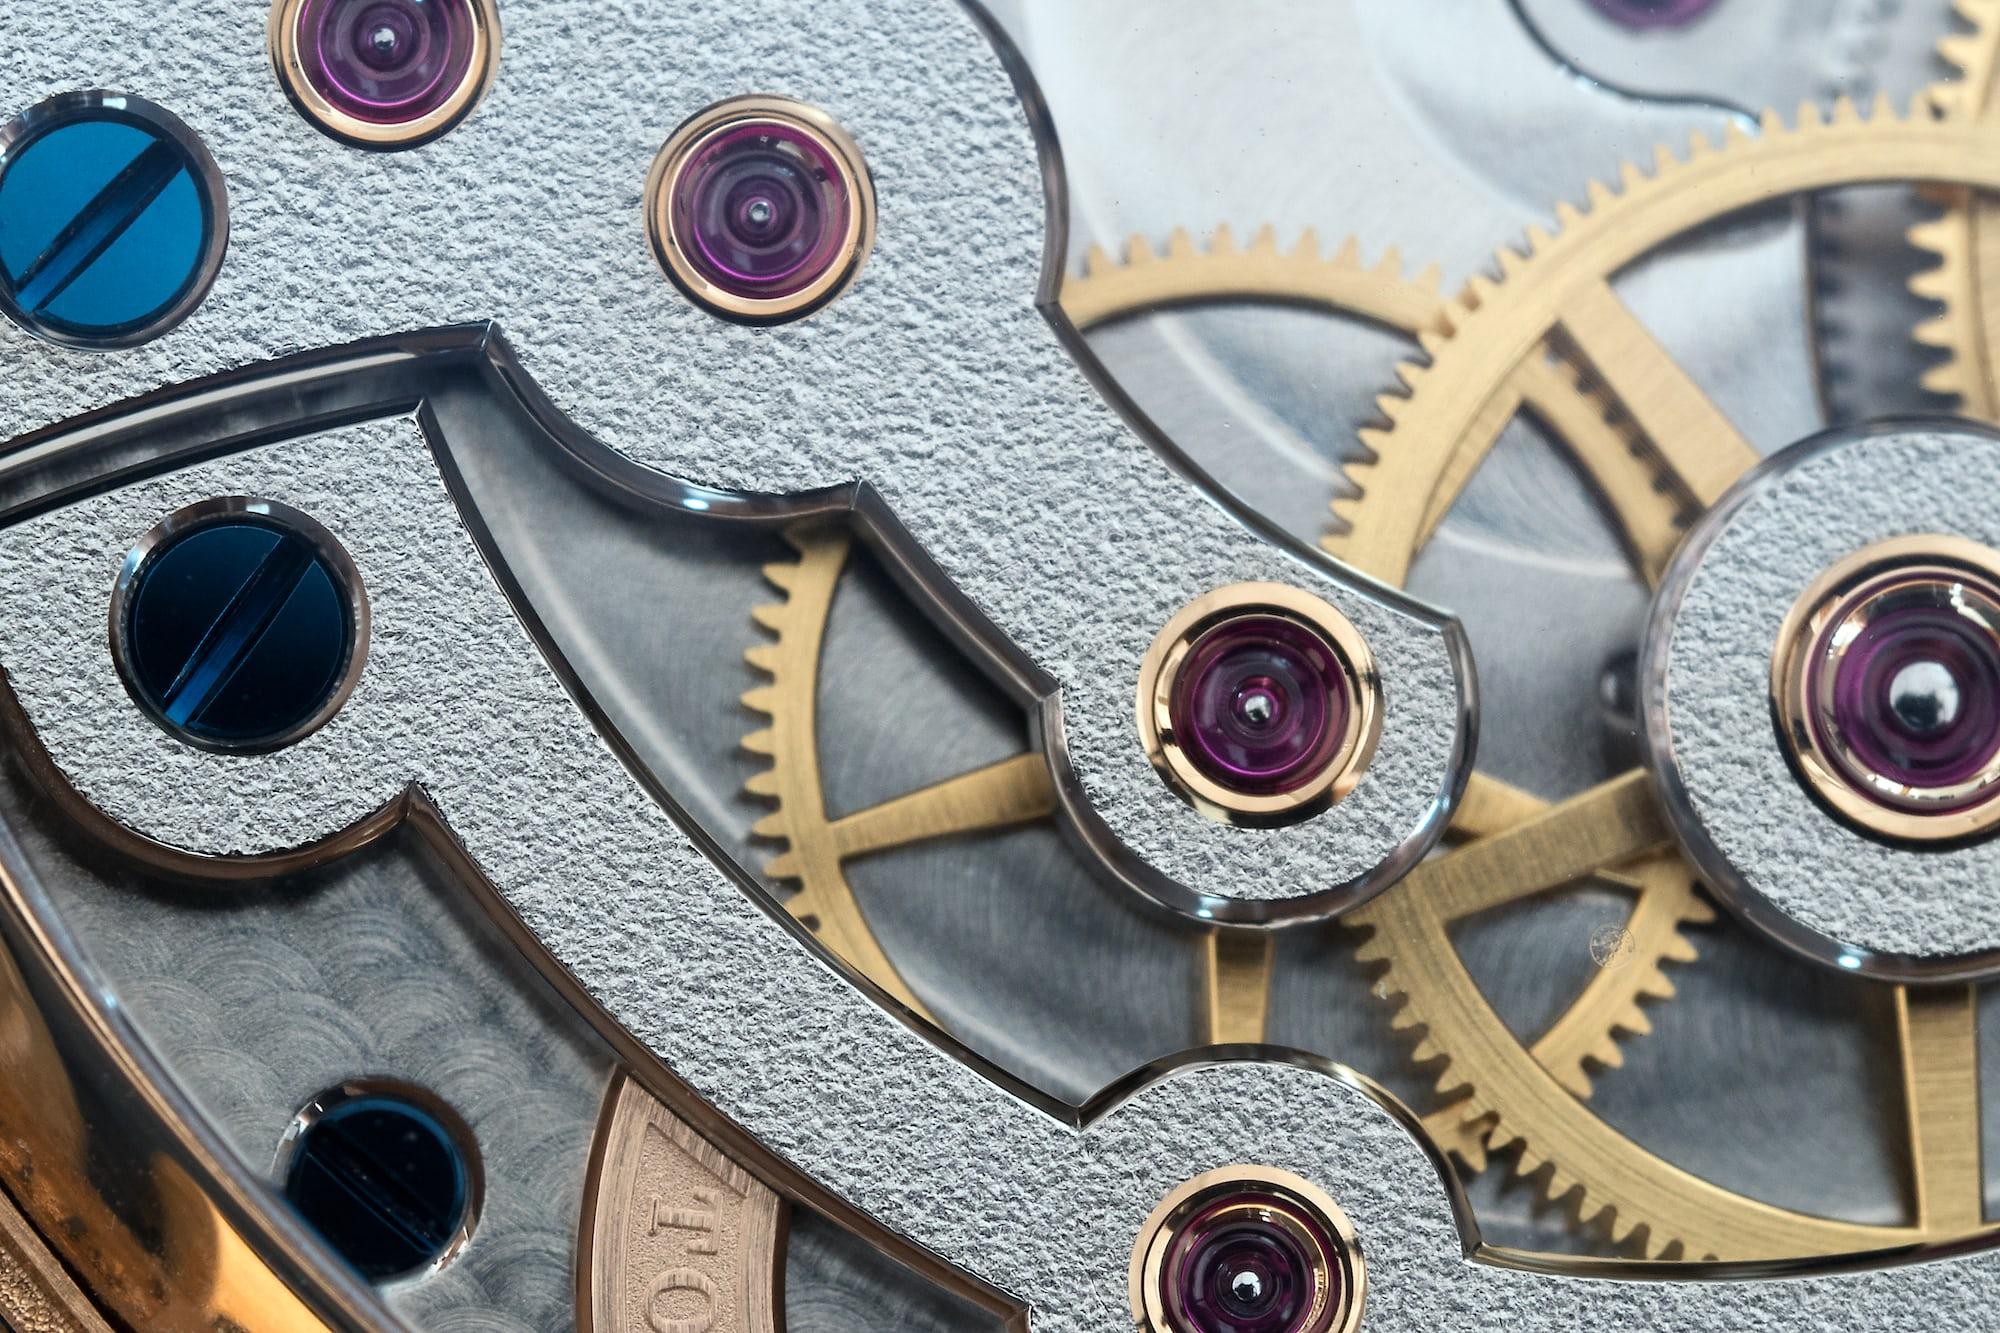 In-Depth: The Greubel Forsey Tourbillon 24 Secondes Asymtrique Edition Historique. In-Depth: The Greubel Forsey Tourbillon 24 Secondes Asymtrique Edition Historique. P7312112